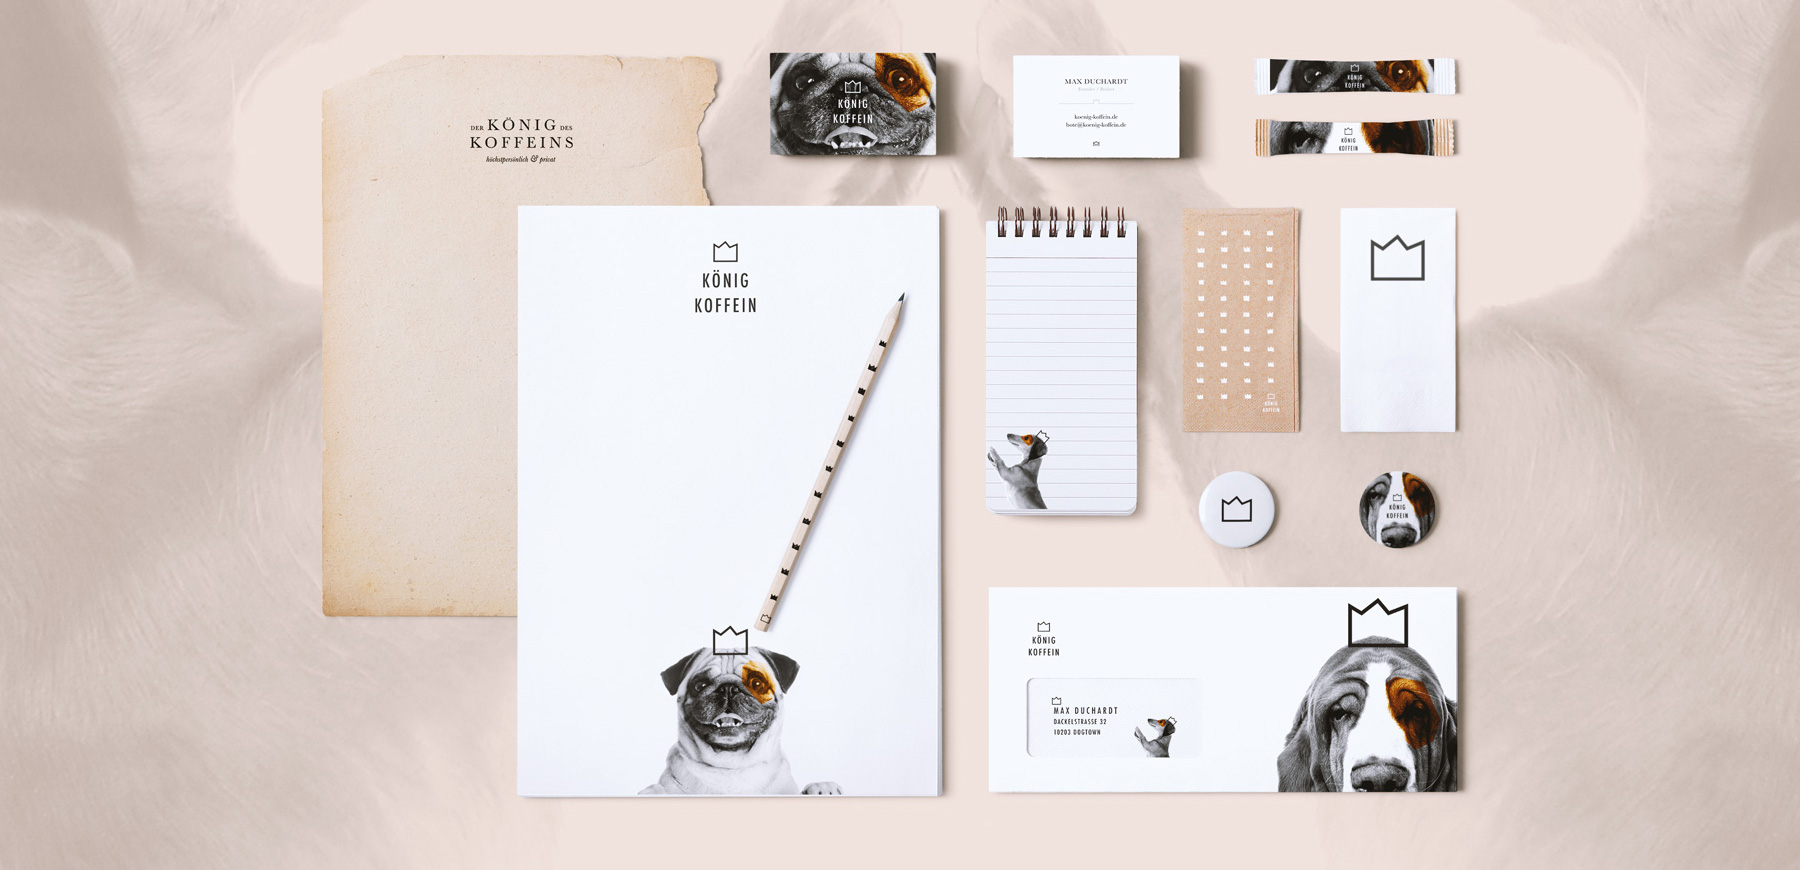 koenig-koffein-brand-corporate-design-identity-anwendung-kl-by-max-duchardt